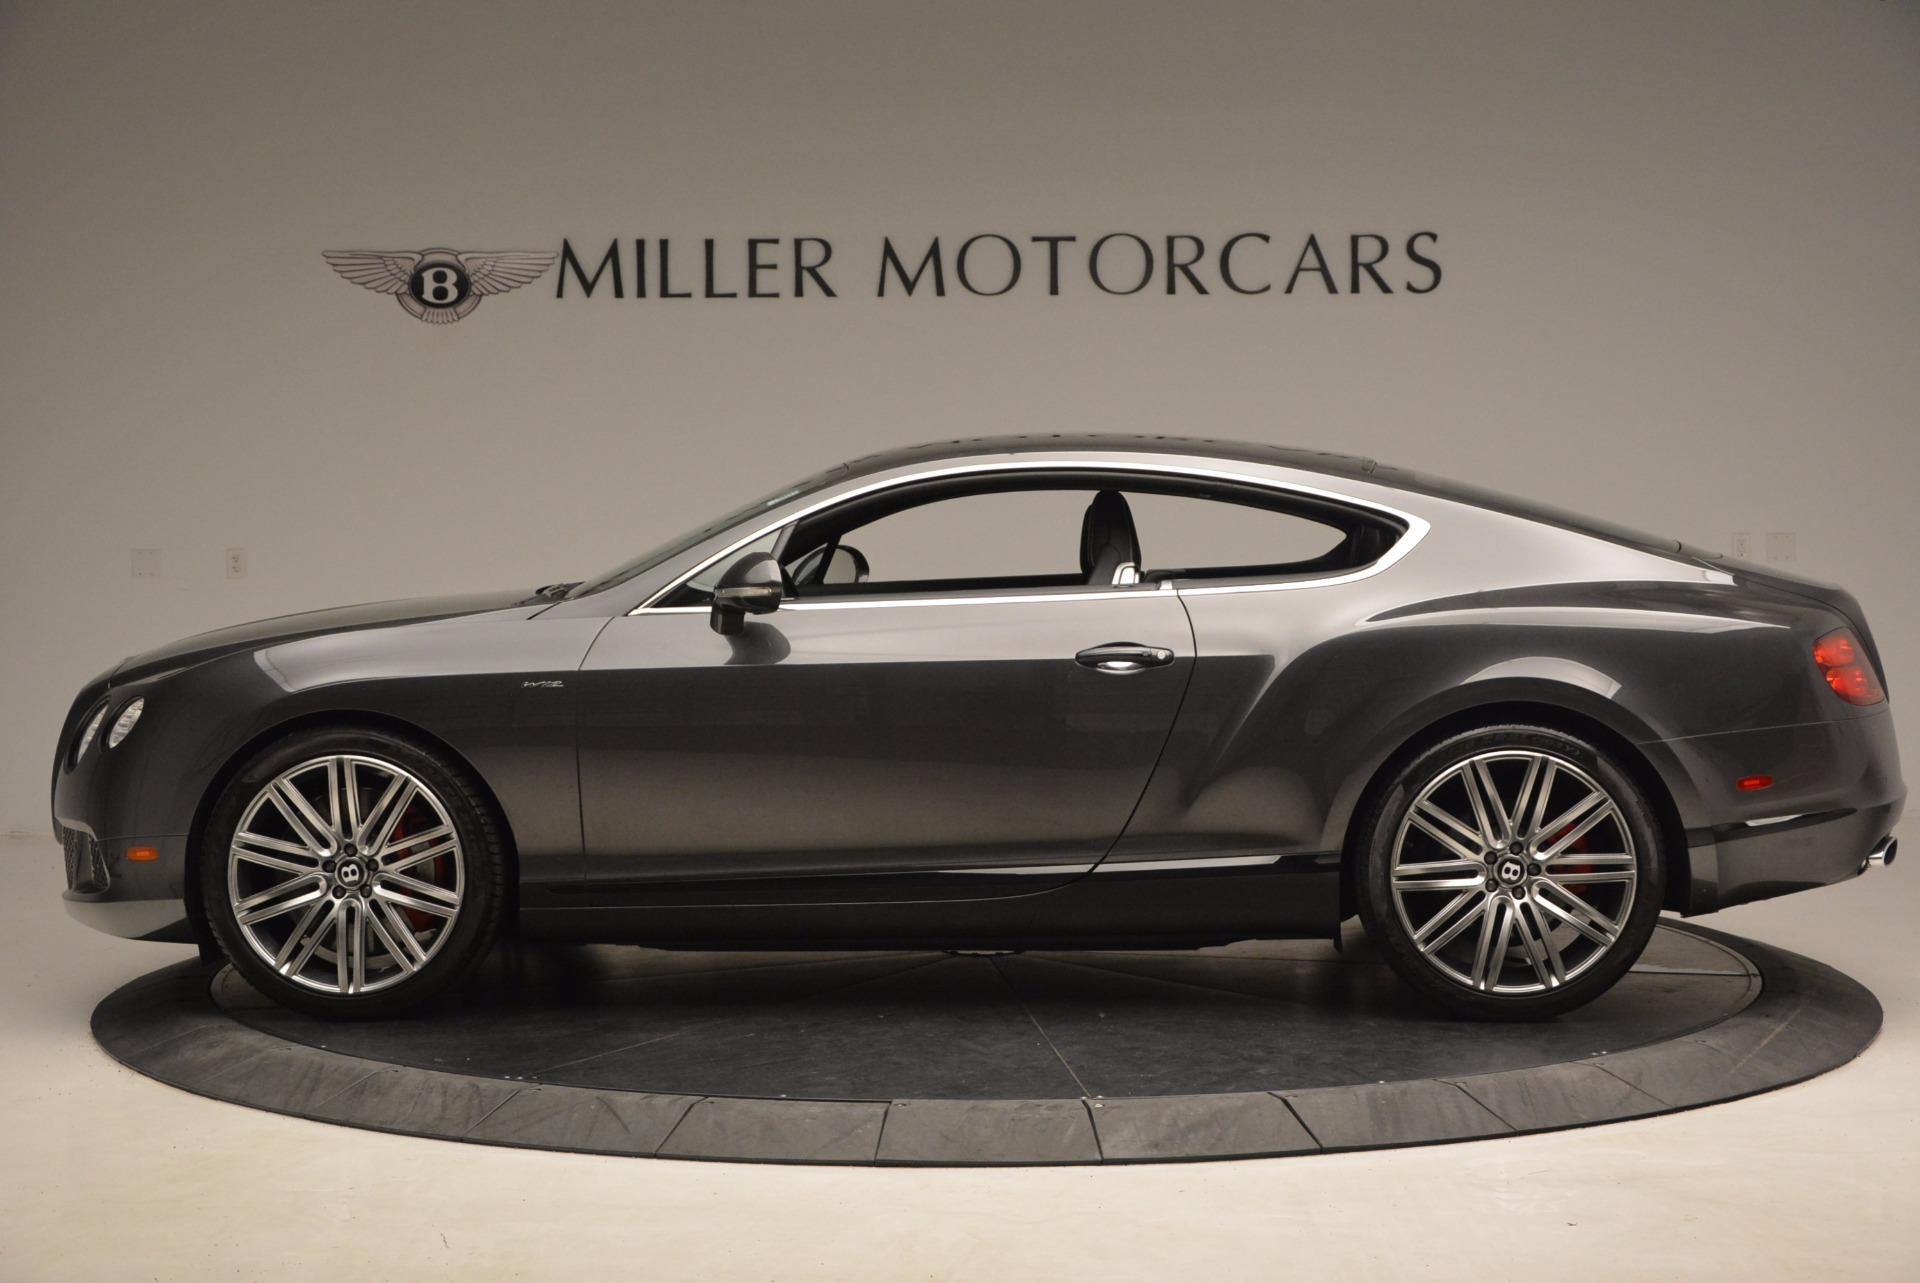 Used 2014 Bentley Continental GT Speed For Sale In Westport, CT 1473_p3